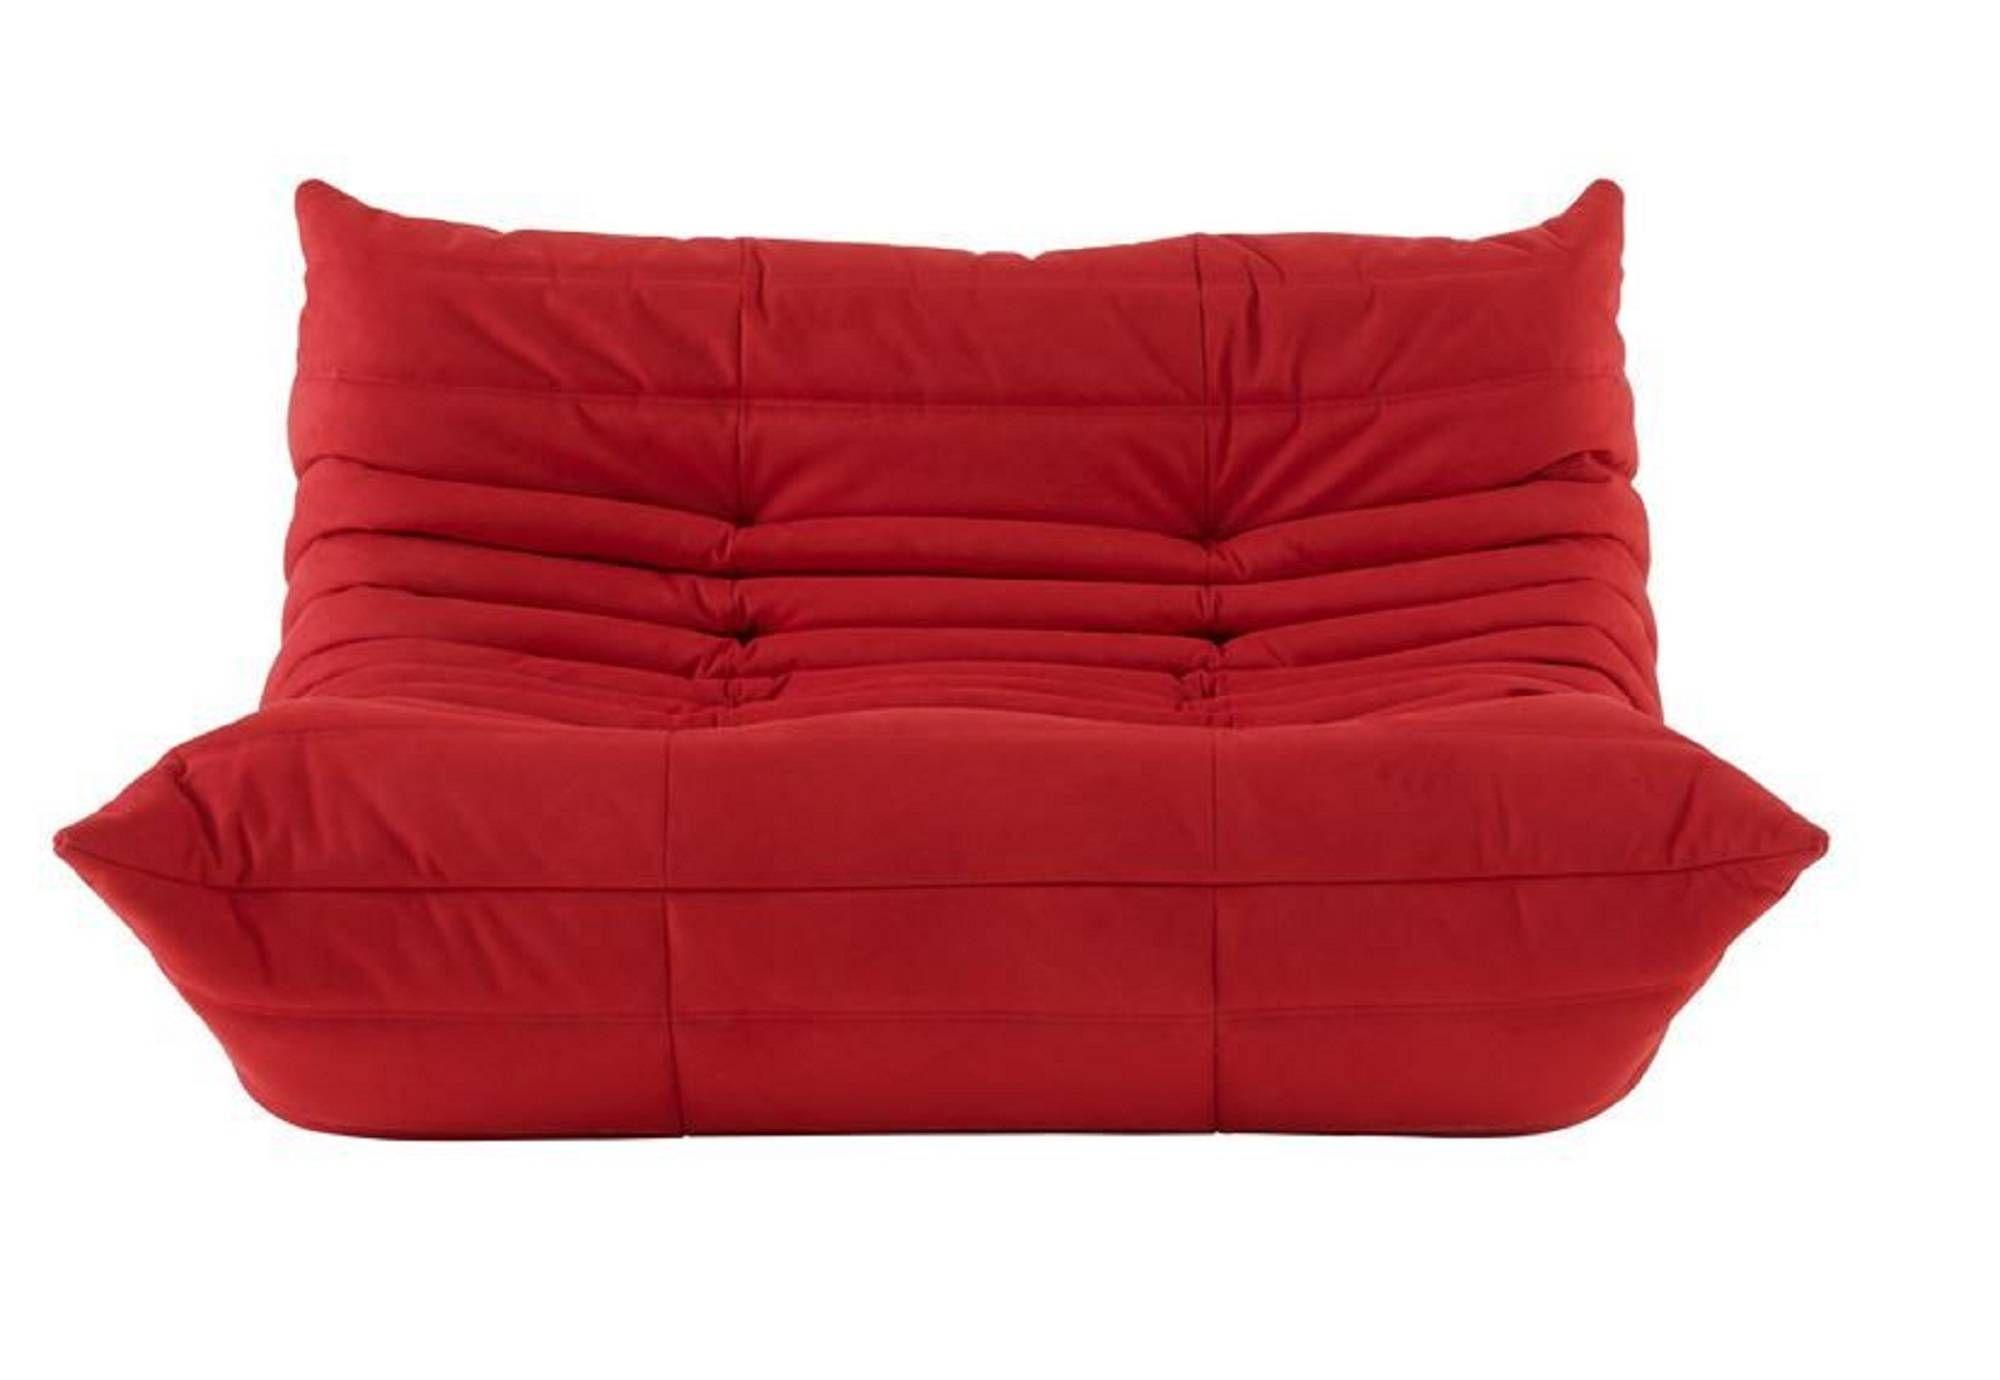 Ligne Roset Togo Small Sofa By Michel Ducaroy Chaplins